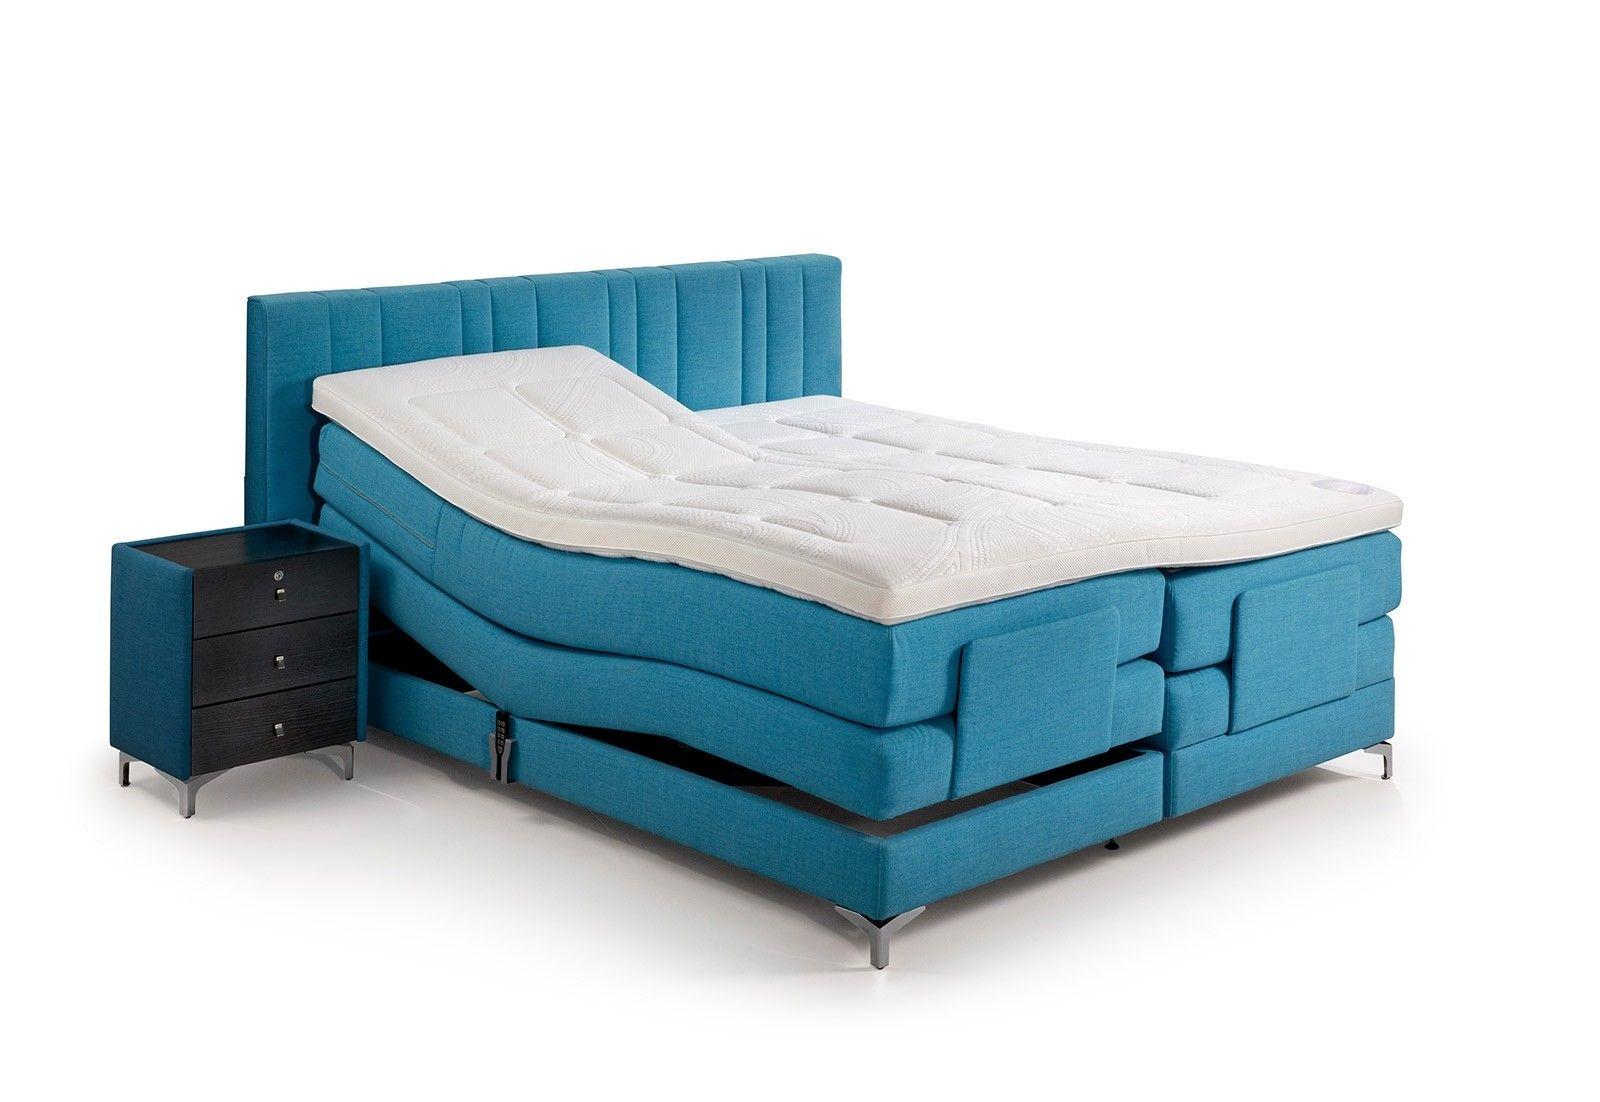 Velda Physio Boxspring 3c Elektrisch Boxspring Bed Boxsprings